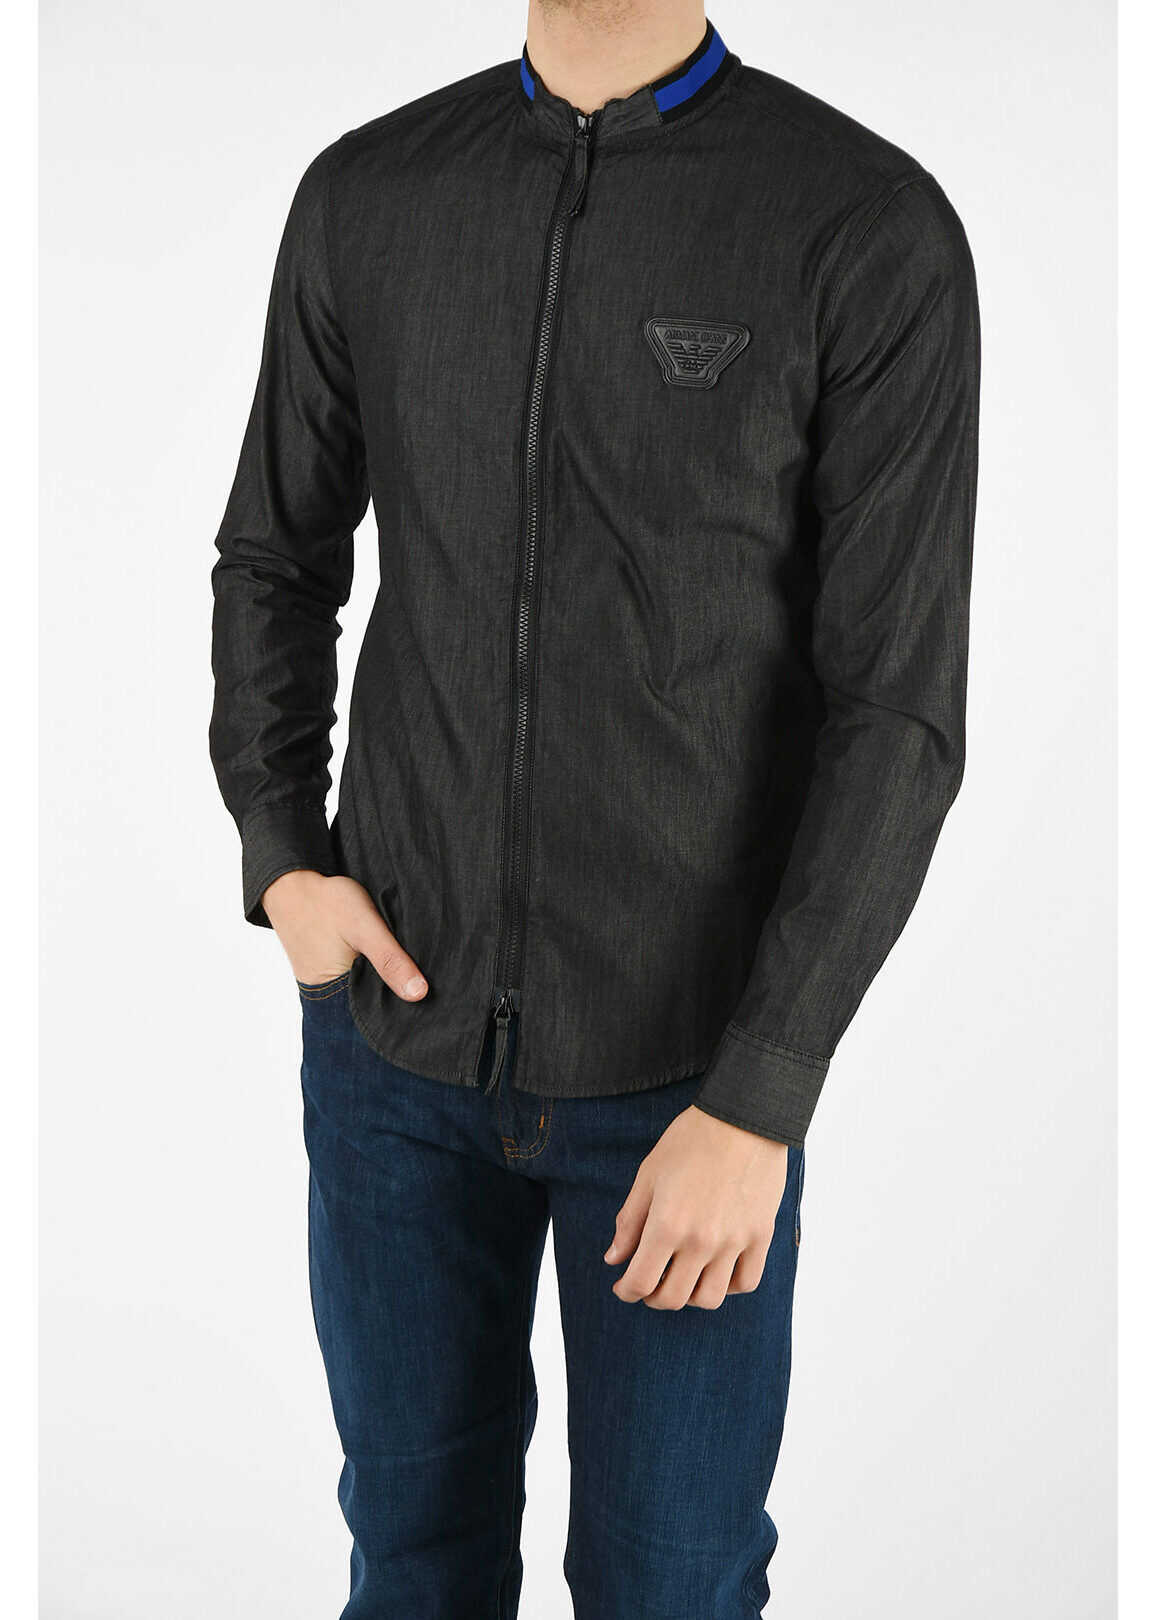 Armani ARMANI JEANS Cotton Jacket GRAY imagine